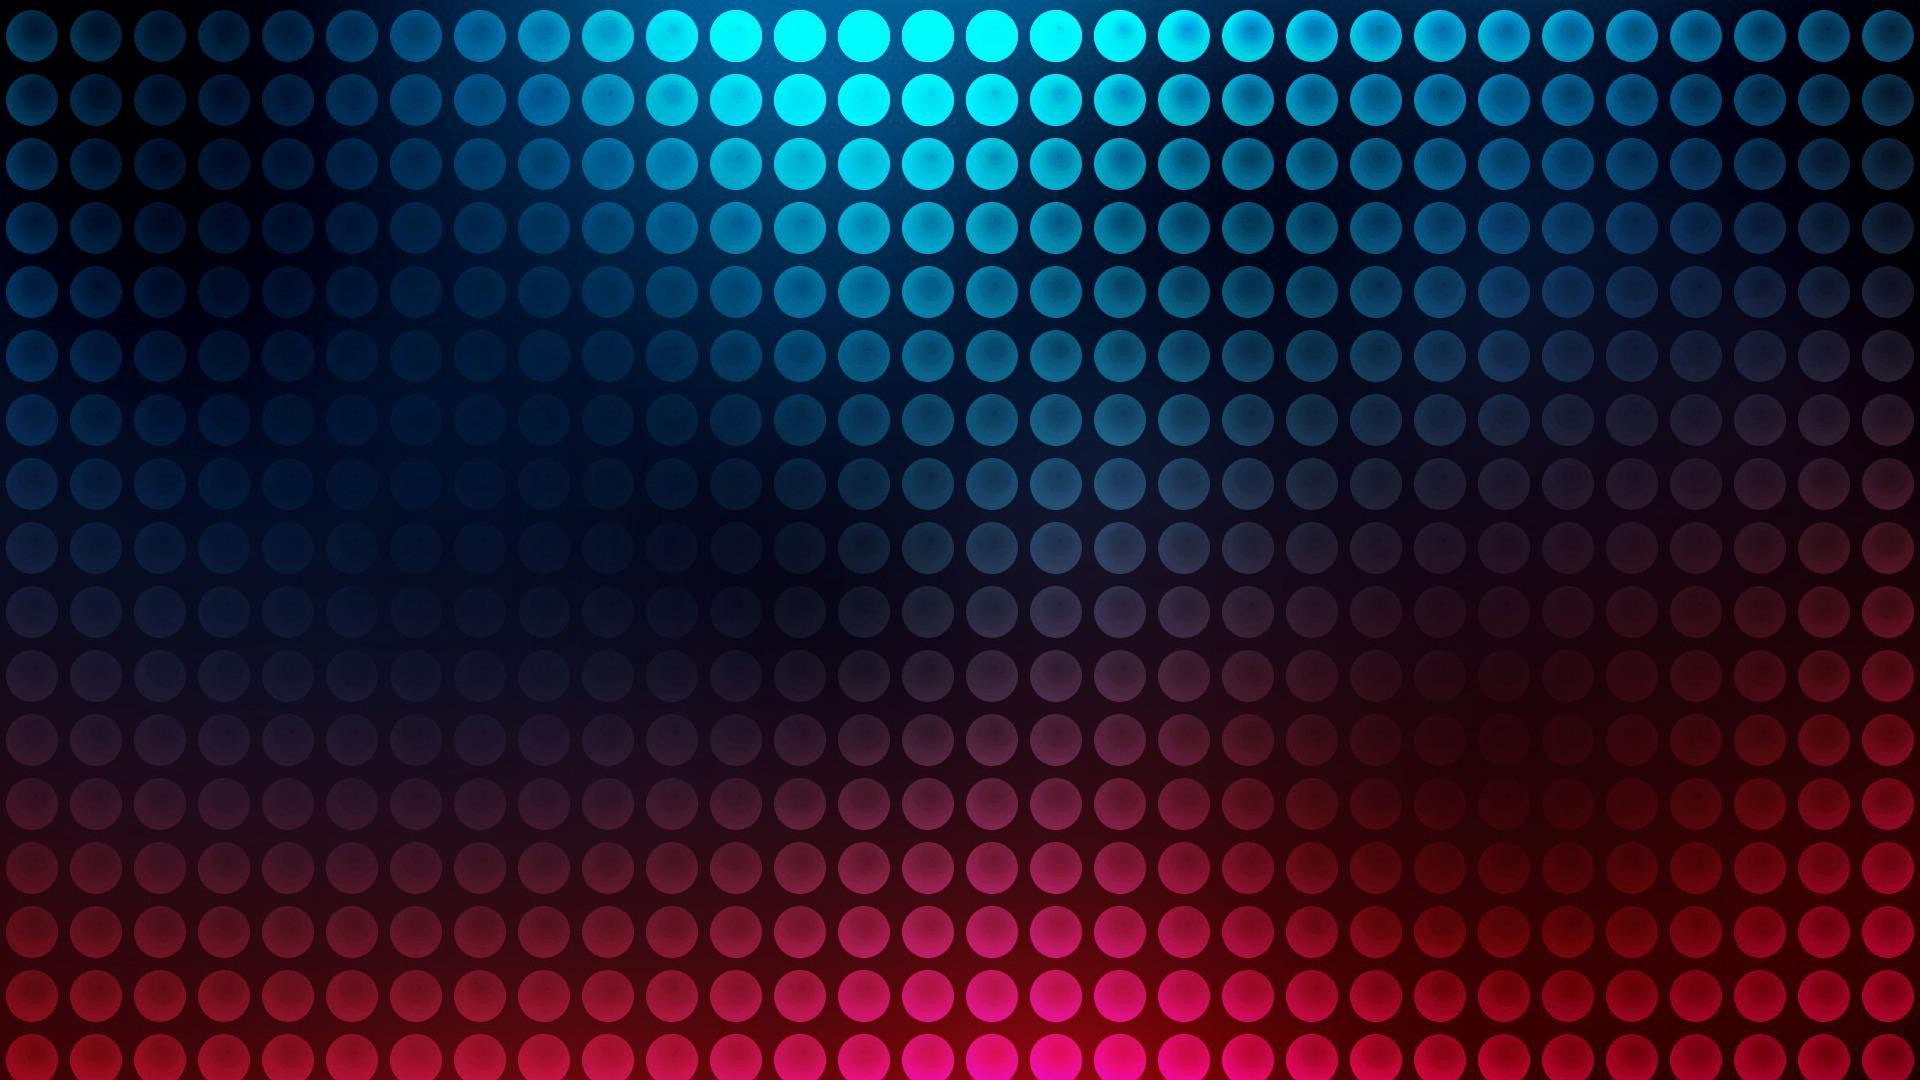 Iphone 6 Shelf Wallpaper Hd Polka Dot Wallpaper 183 ① Download Free Cool High Resolution